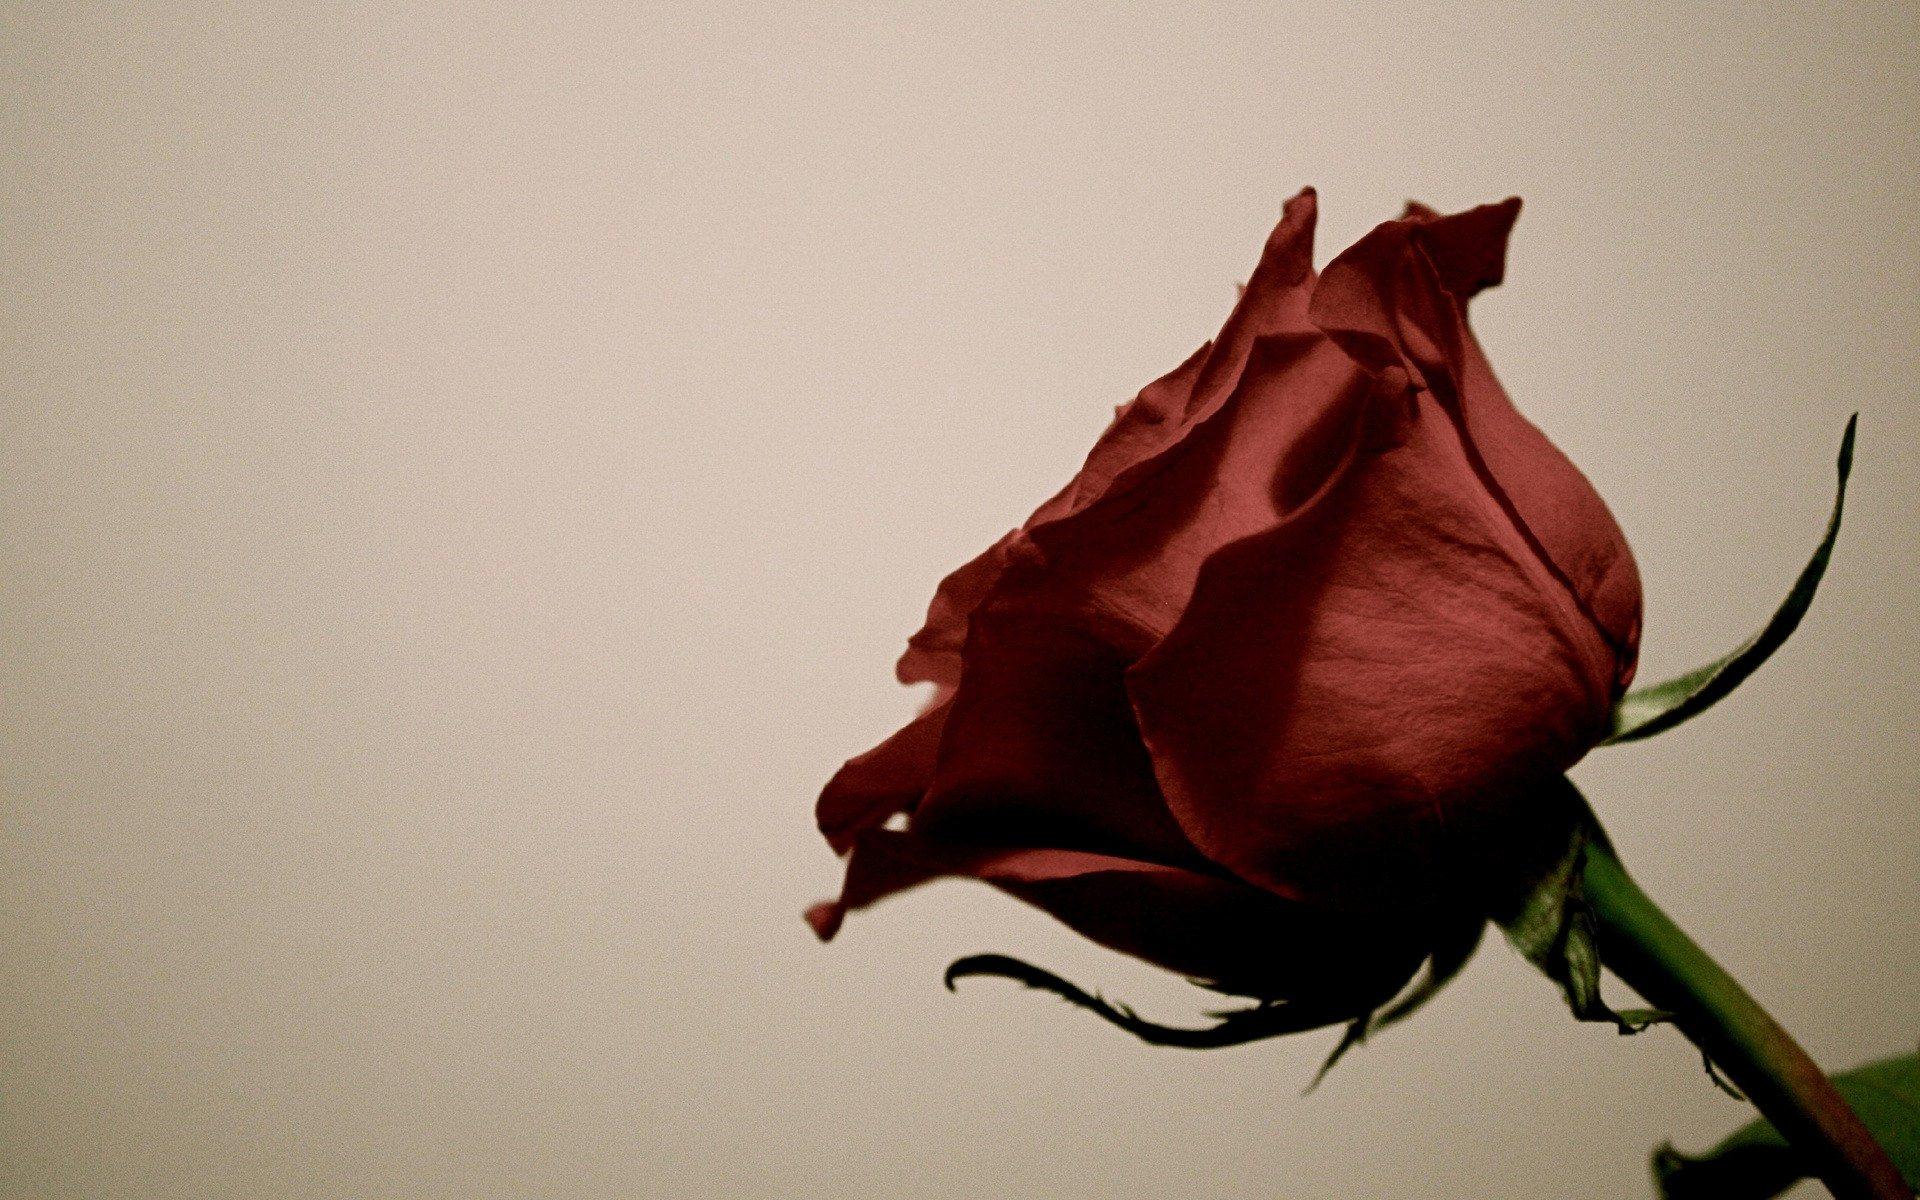 All New Wallpaper Gambar Bunga Mawar Merah Cantik 11 Gambar